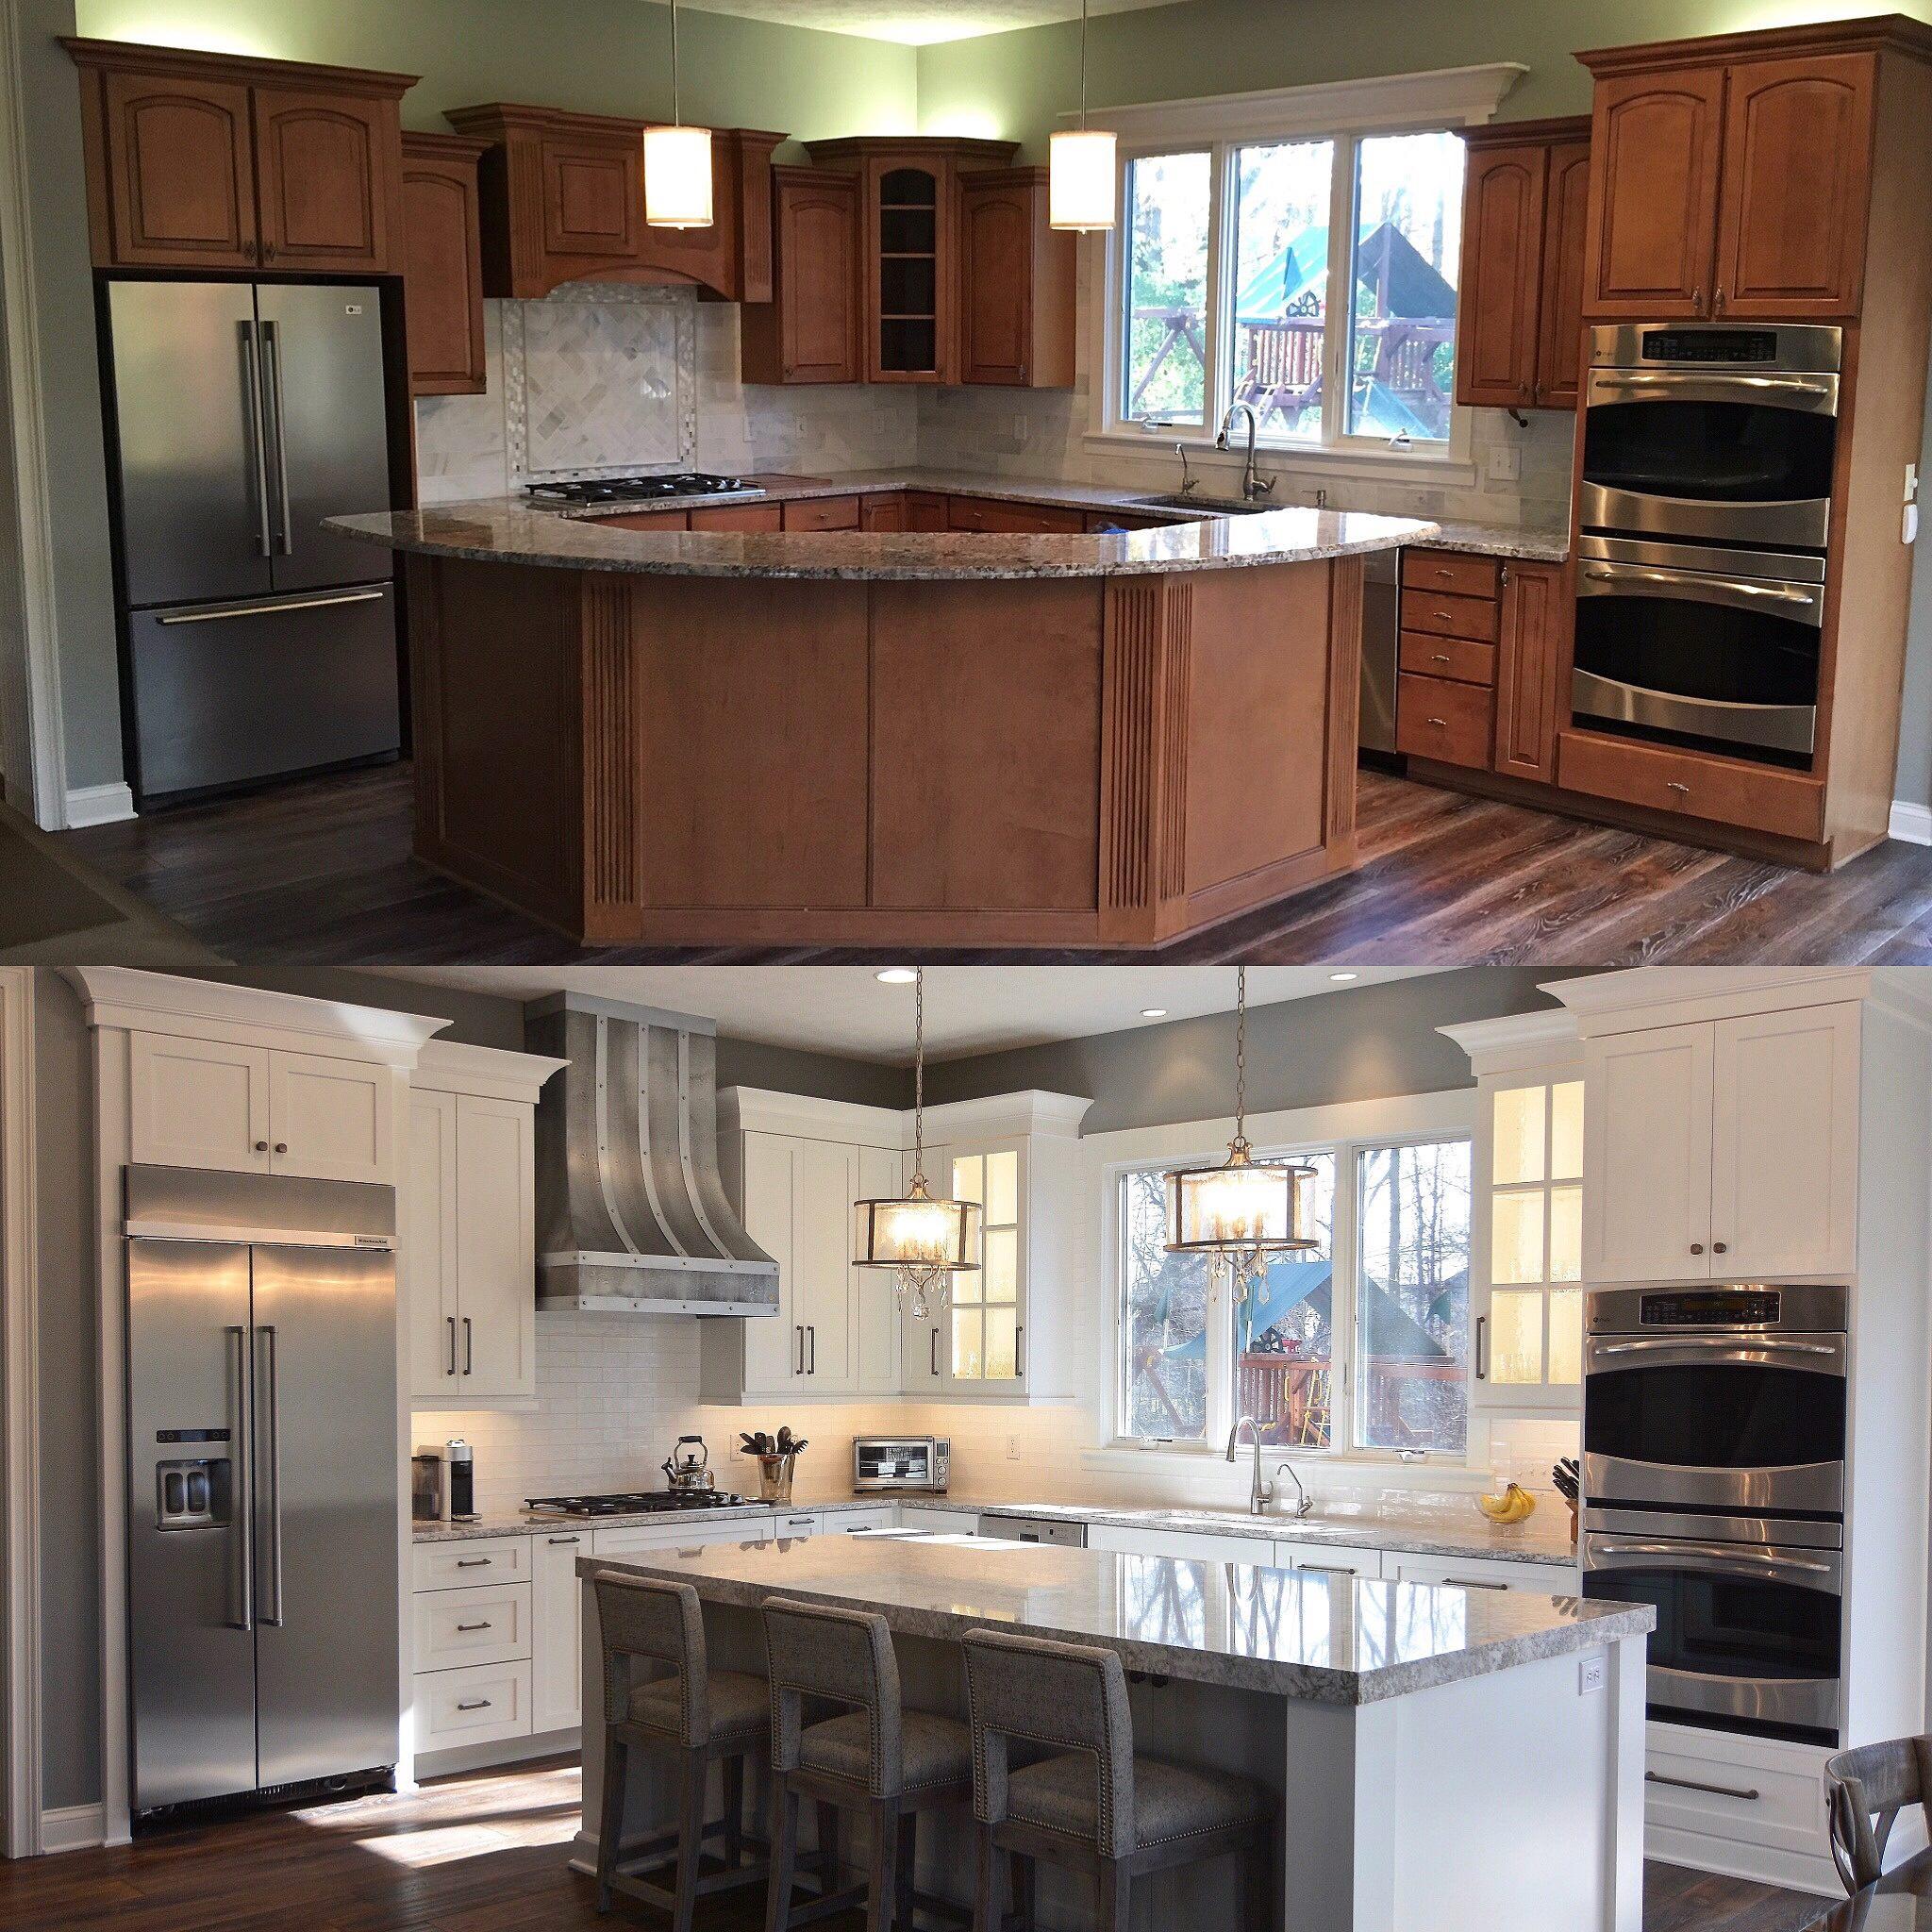 Misc. Kitchen Photos